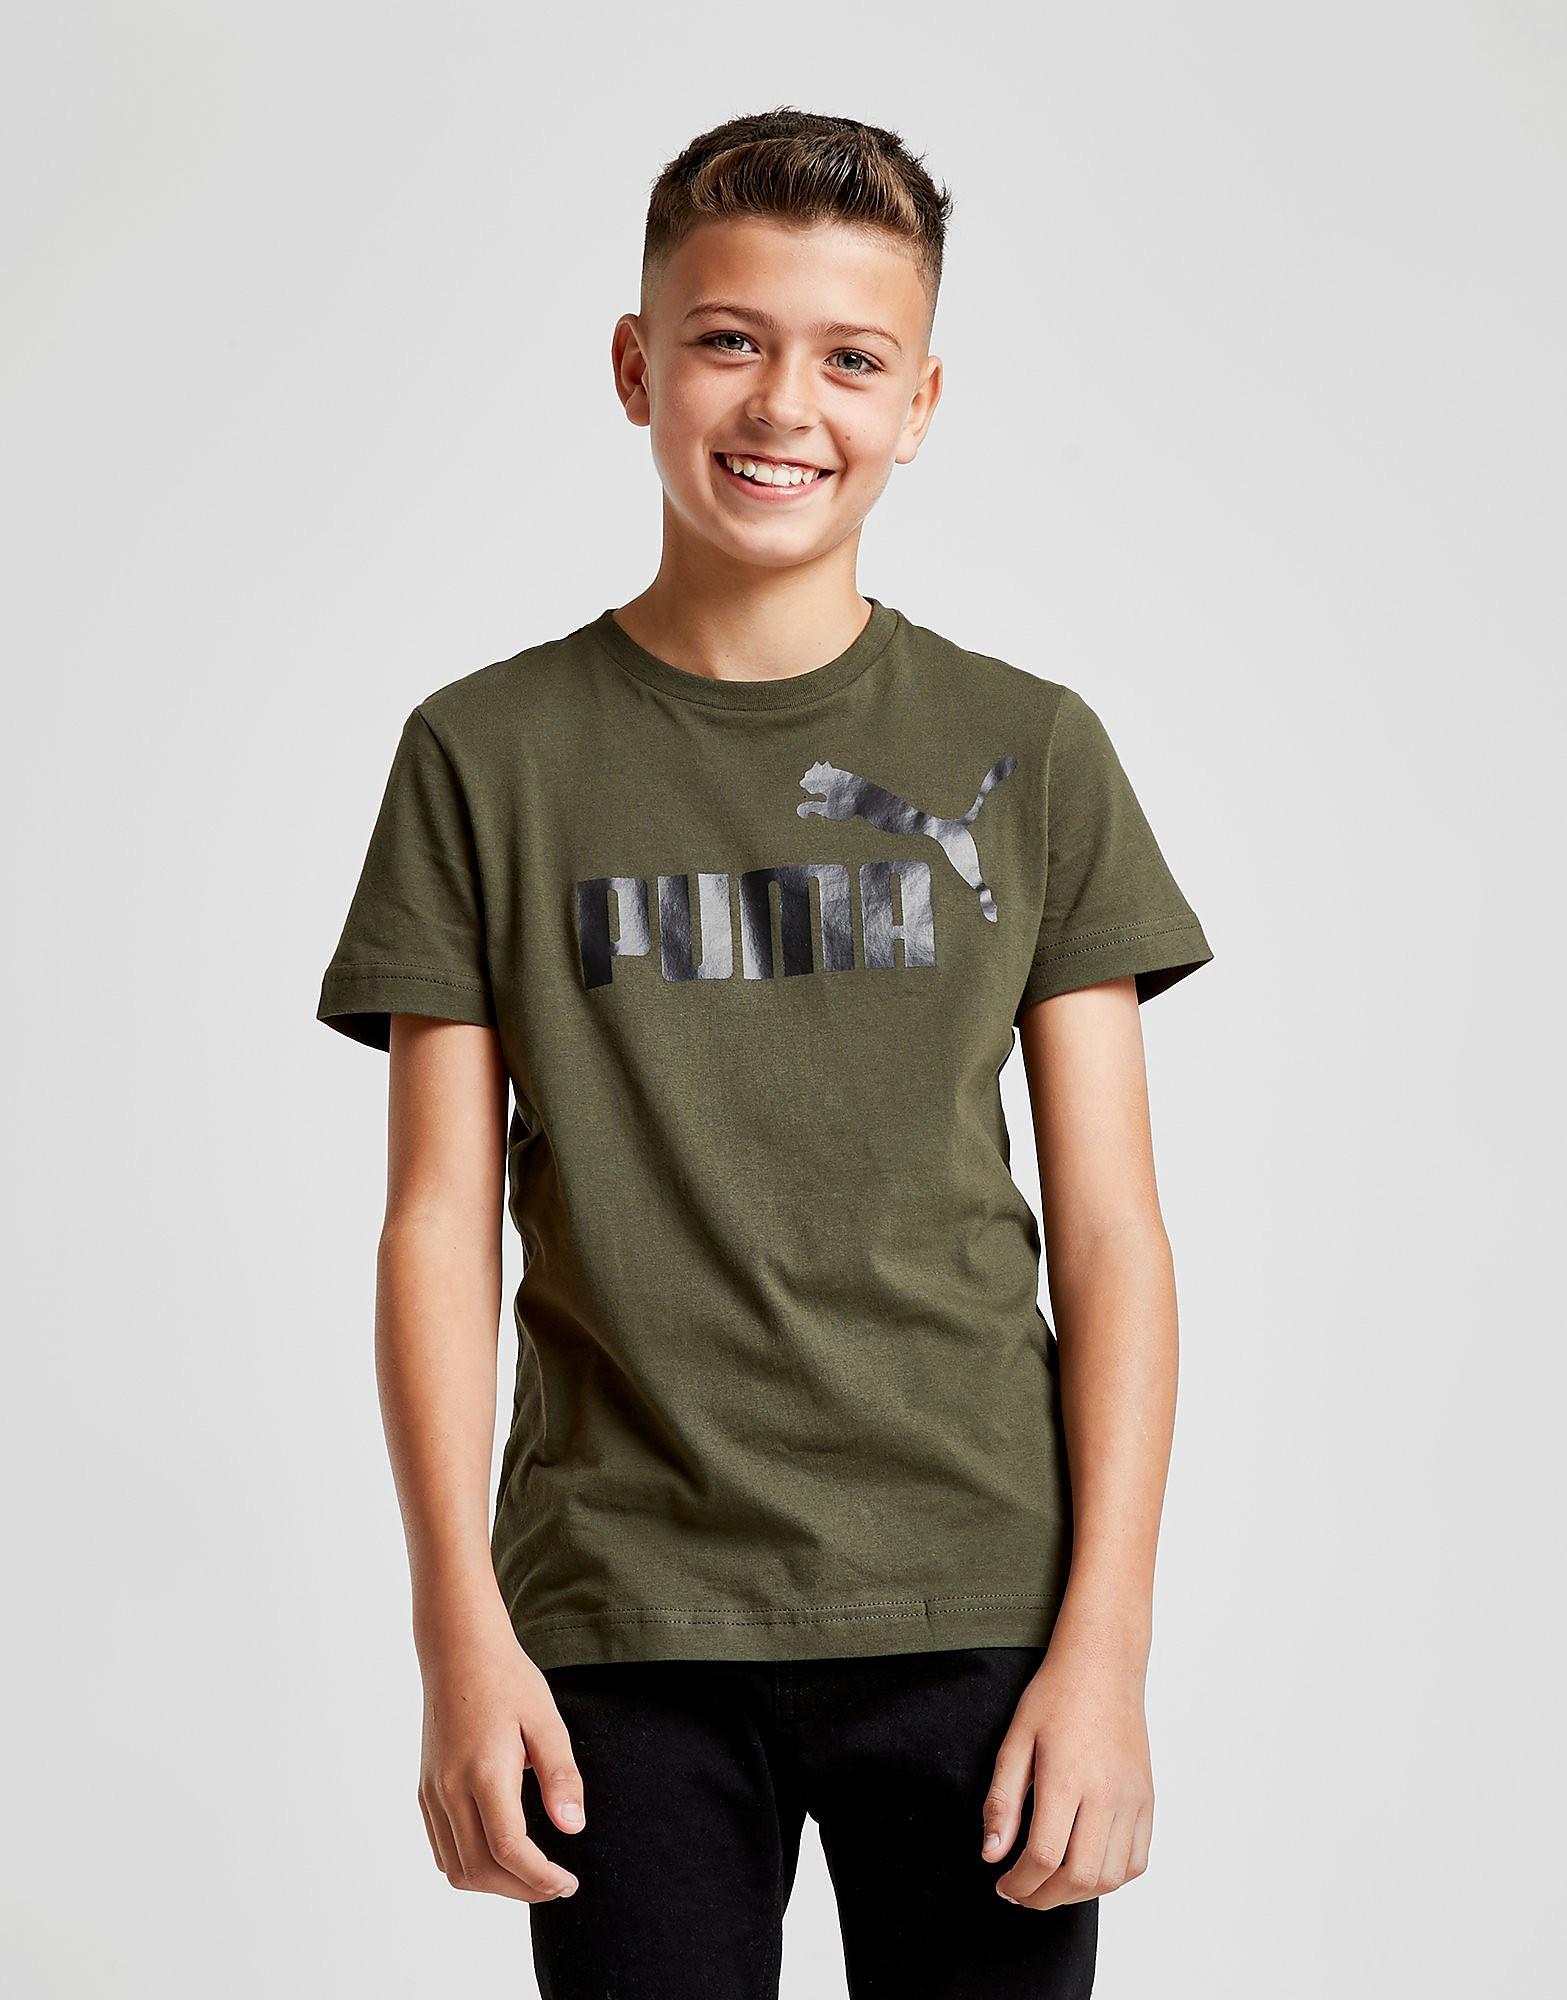 PUMA Logo T-Shirt Junior - Groen - Kind